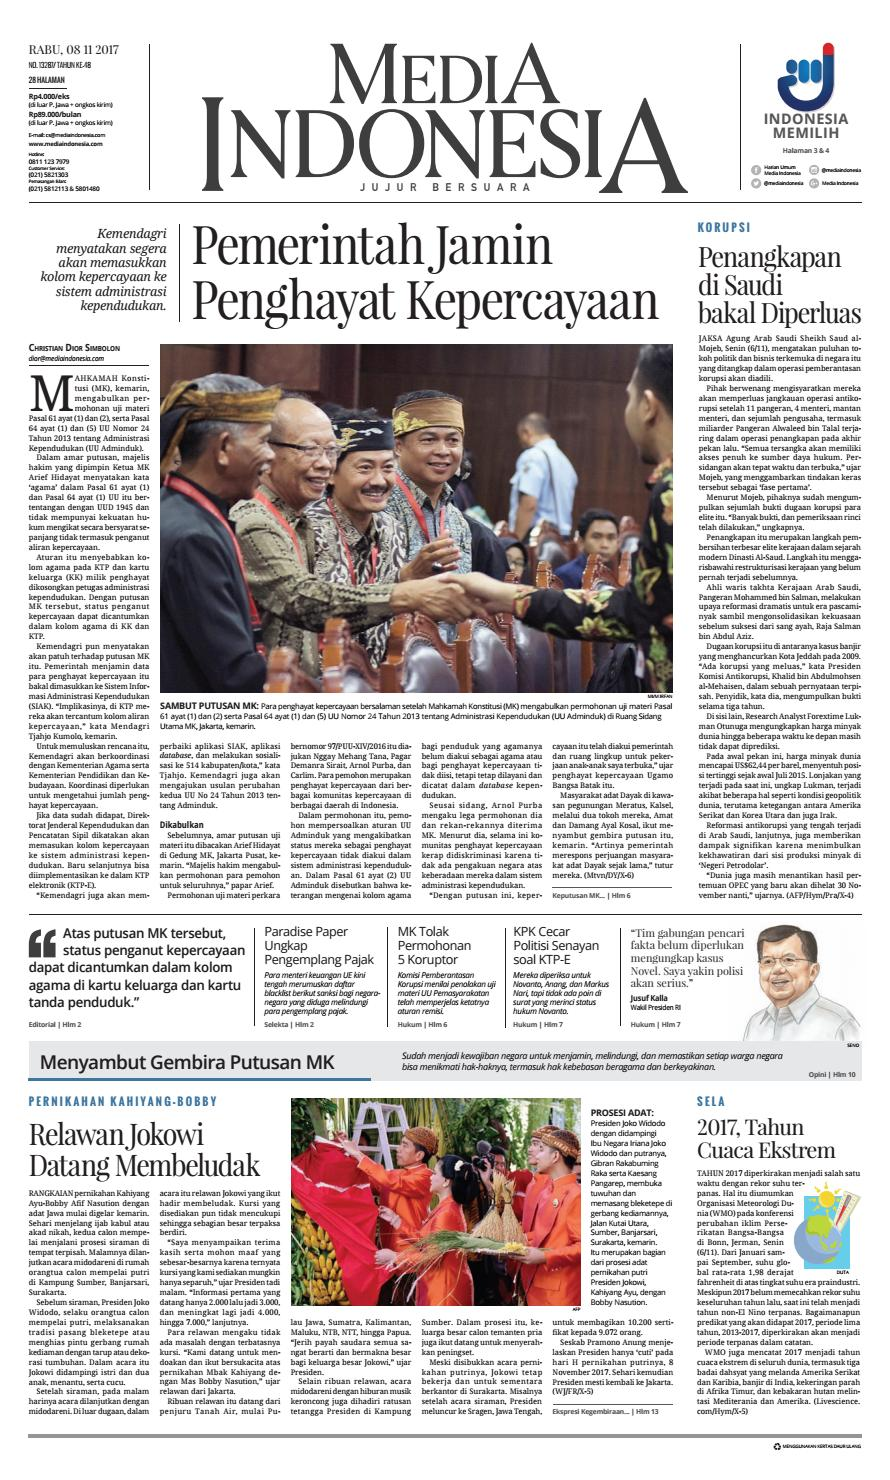 Media Indonesia 08 11 2017 08112017115553 By Oppah Issuu Produk Ukm Bumn Philips Essential 18w